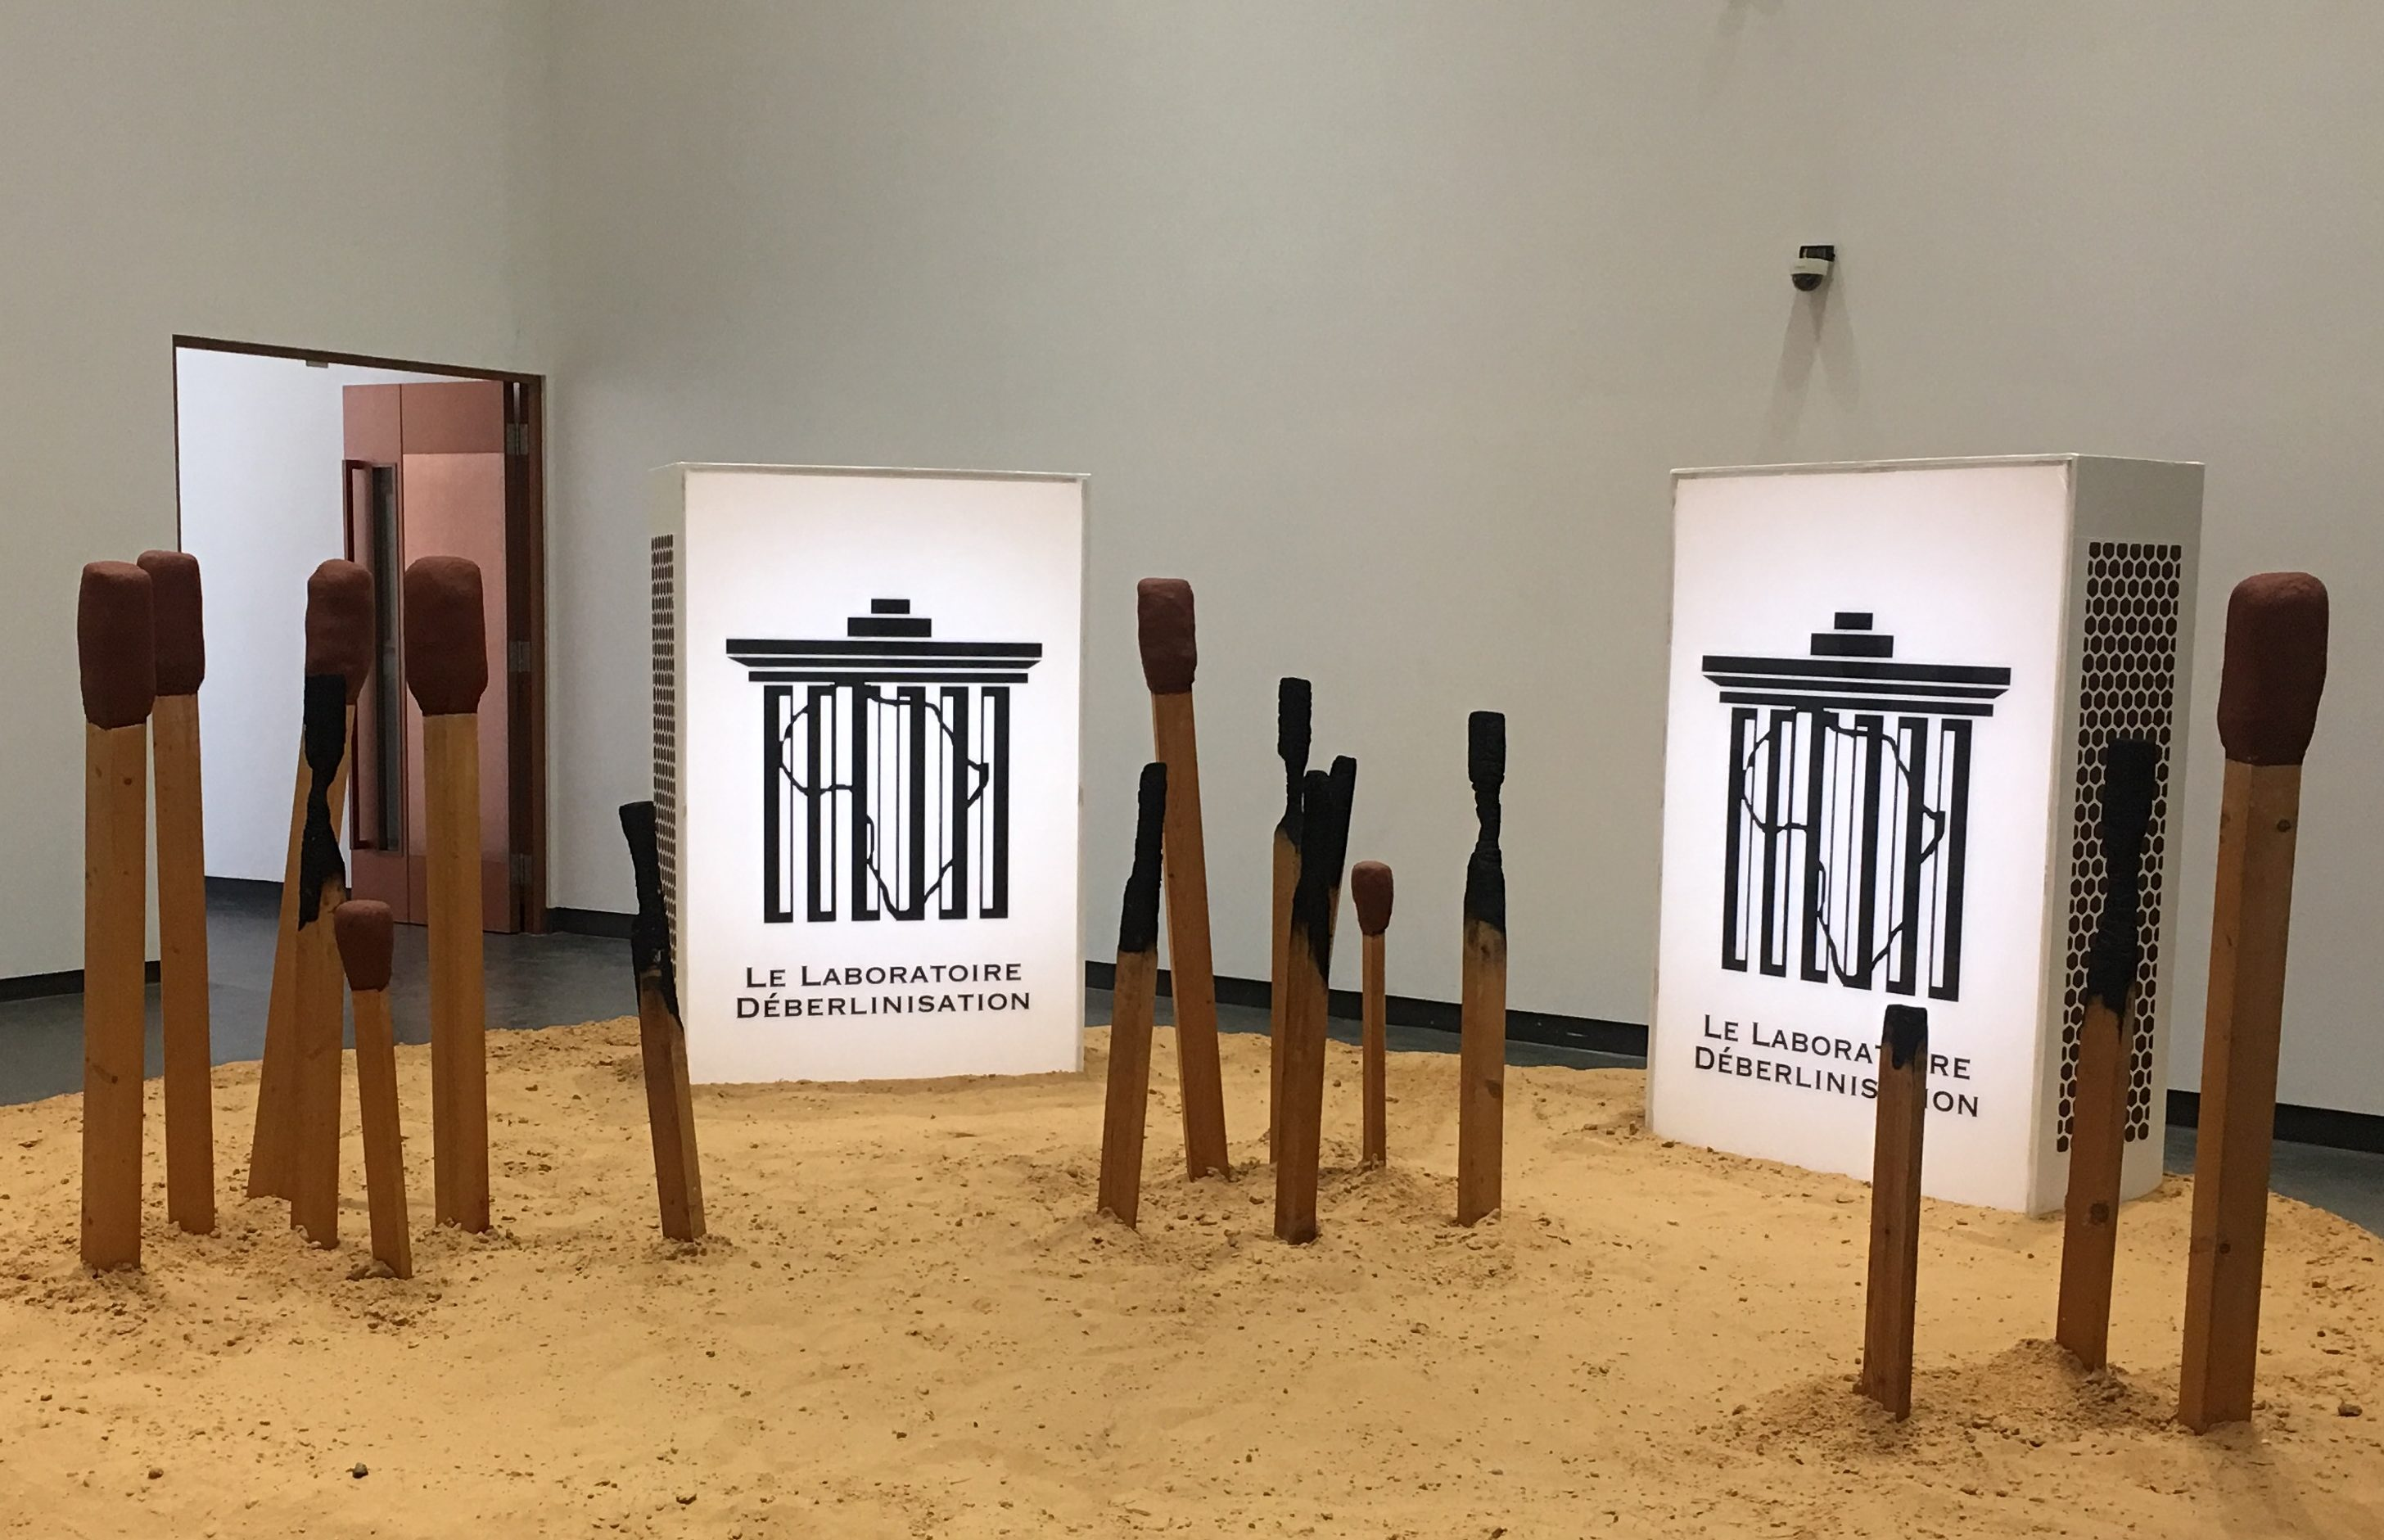 """The Deberlinisation Lab"" byMansour Ciss Kanakassy,Museum of Black Civilisations, Dakar. (Photo courtesy of the author, Mamadou Diallo)"